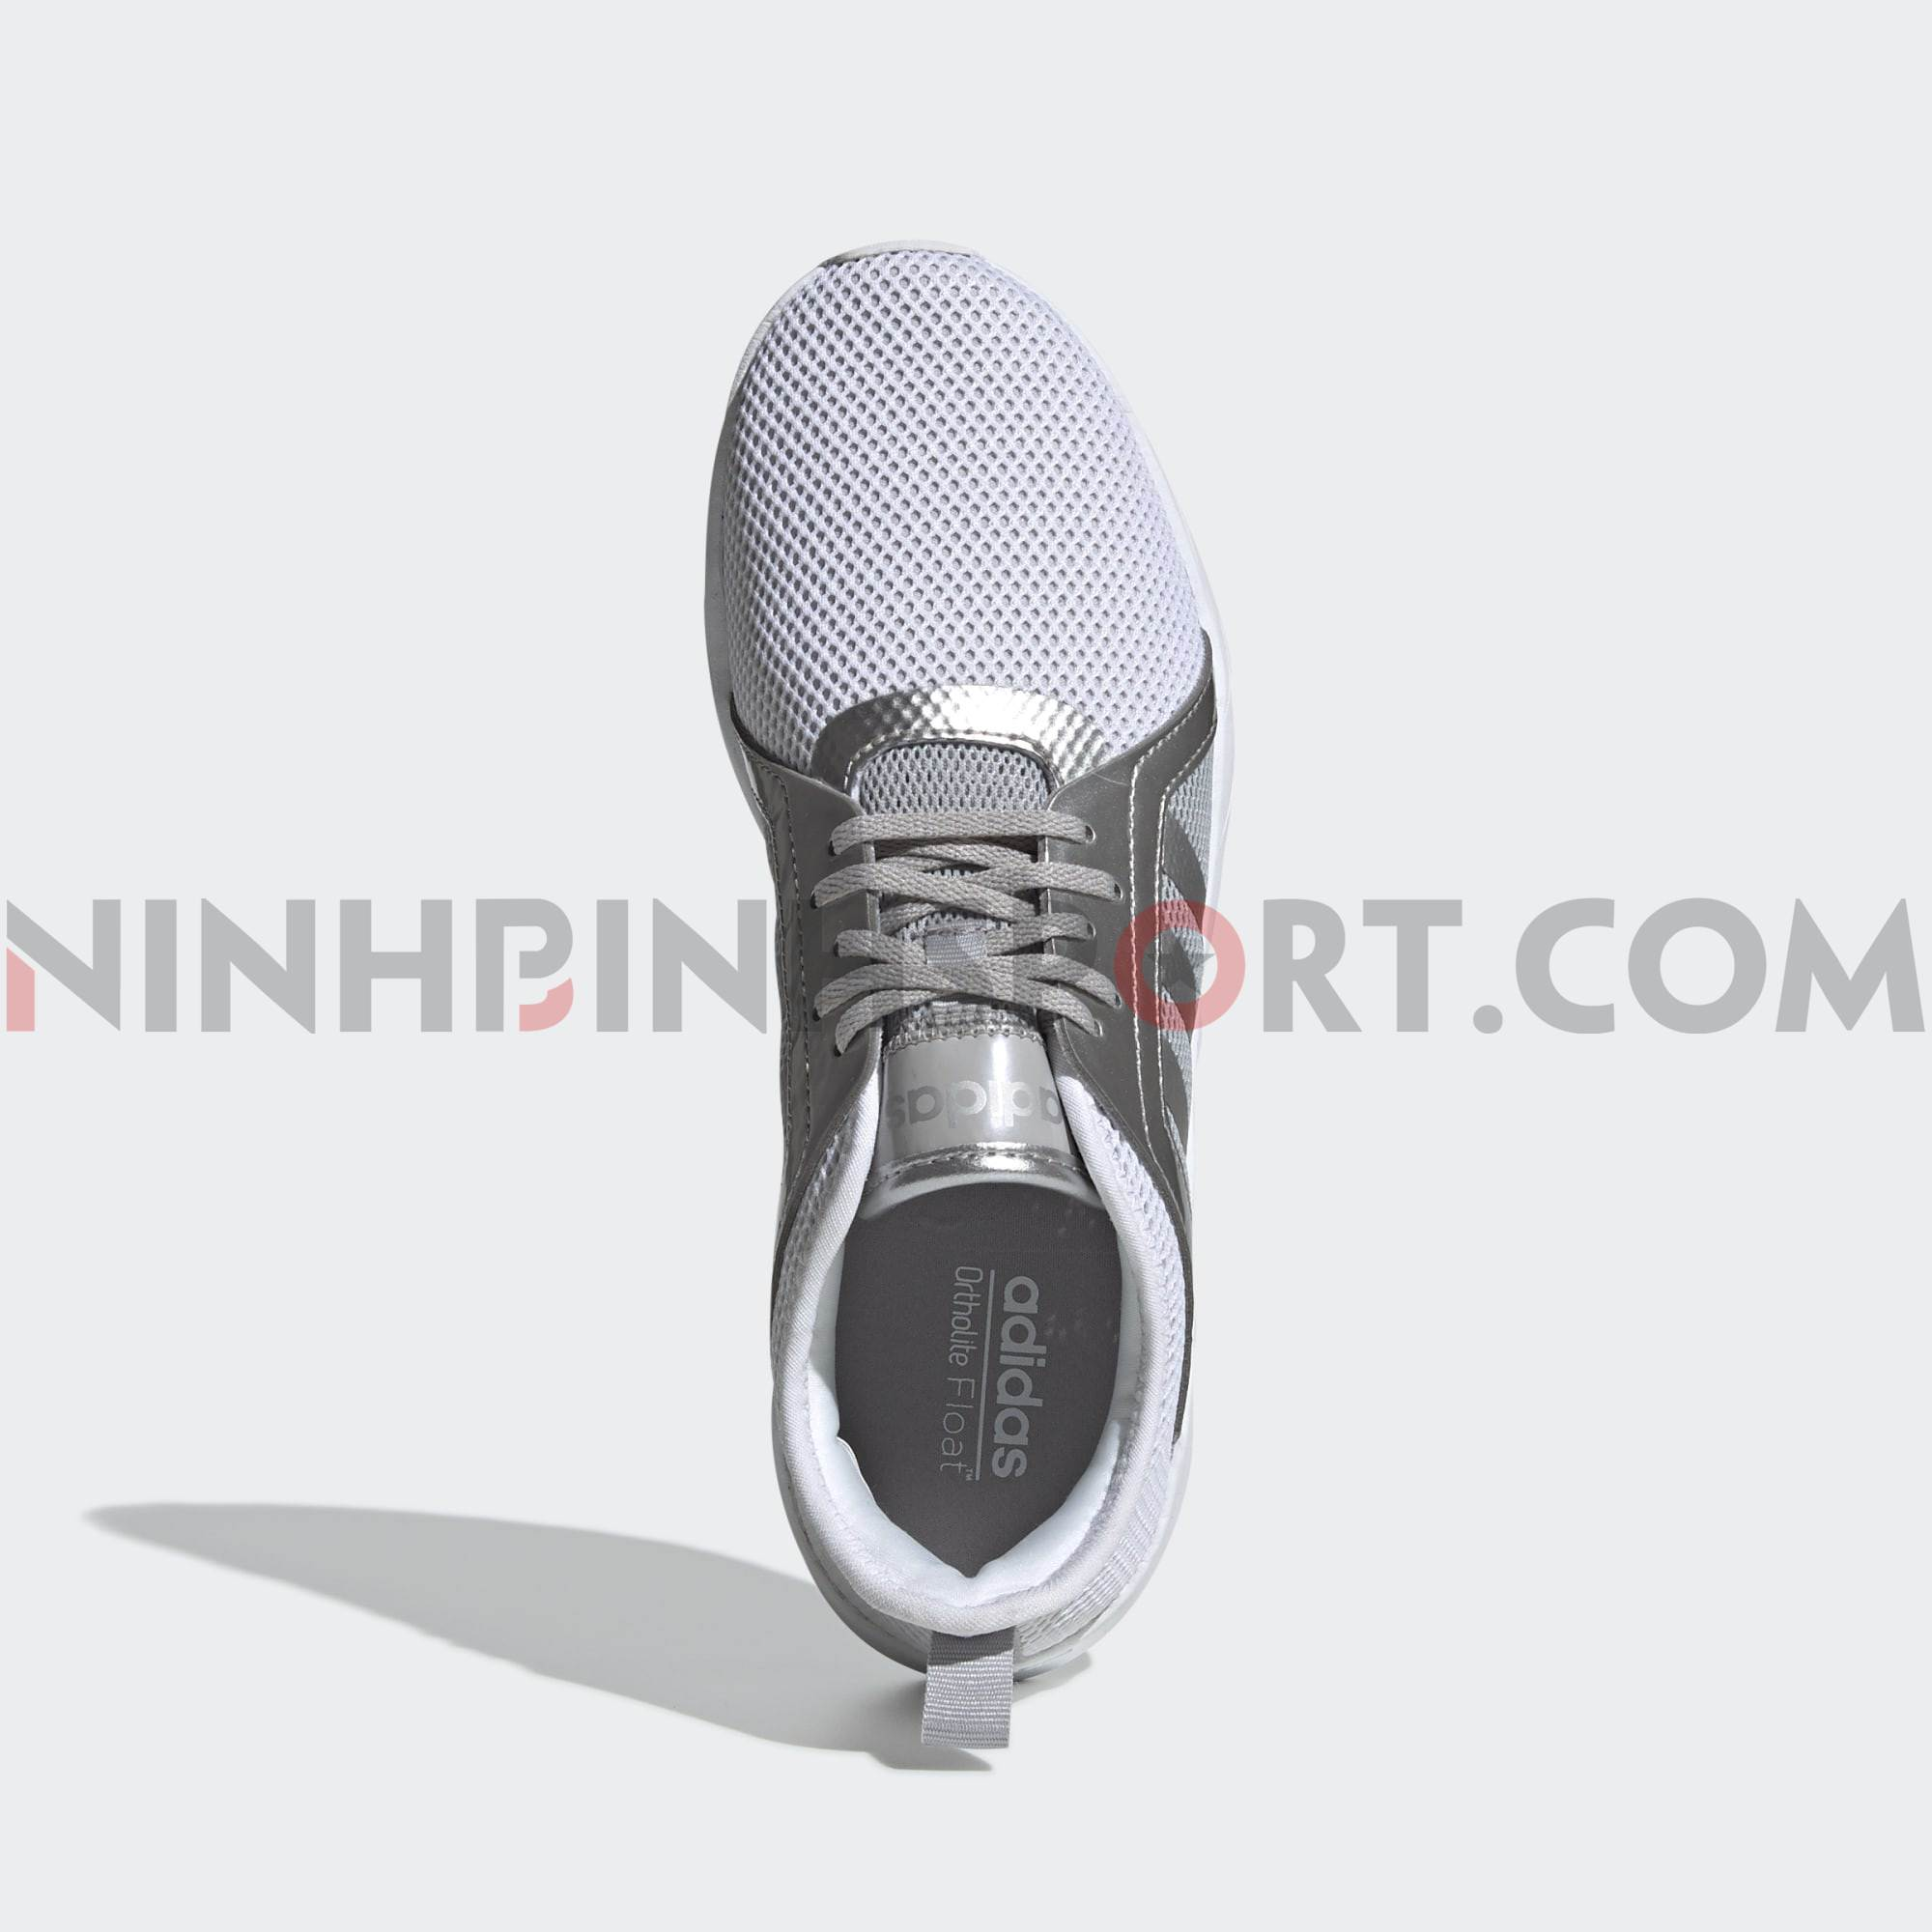 Giầy thể thao nữ Adidas Questar White F36512